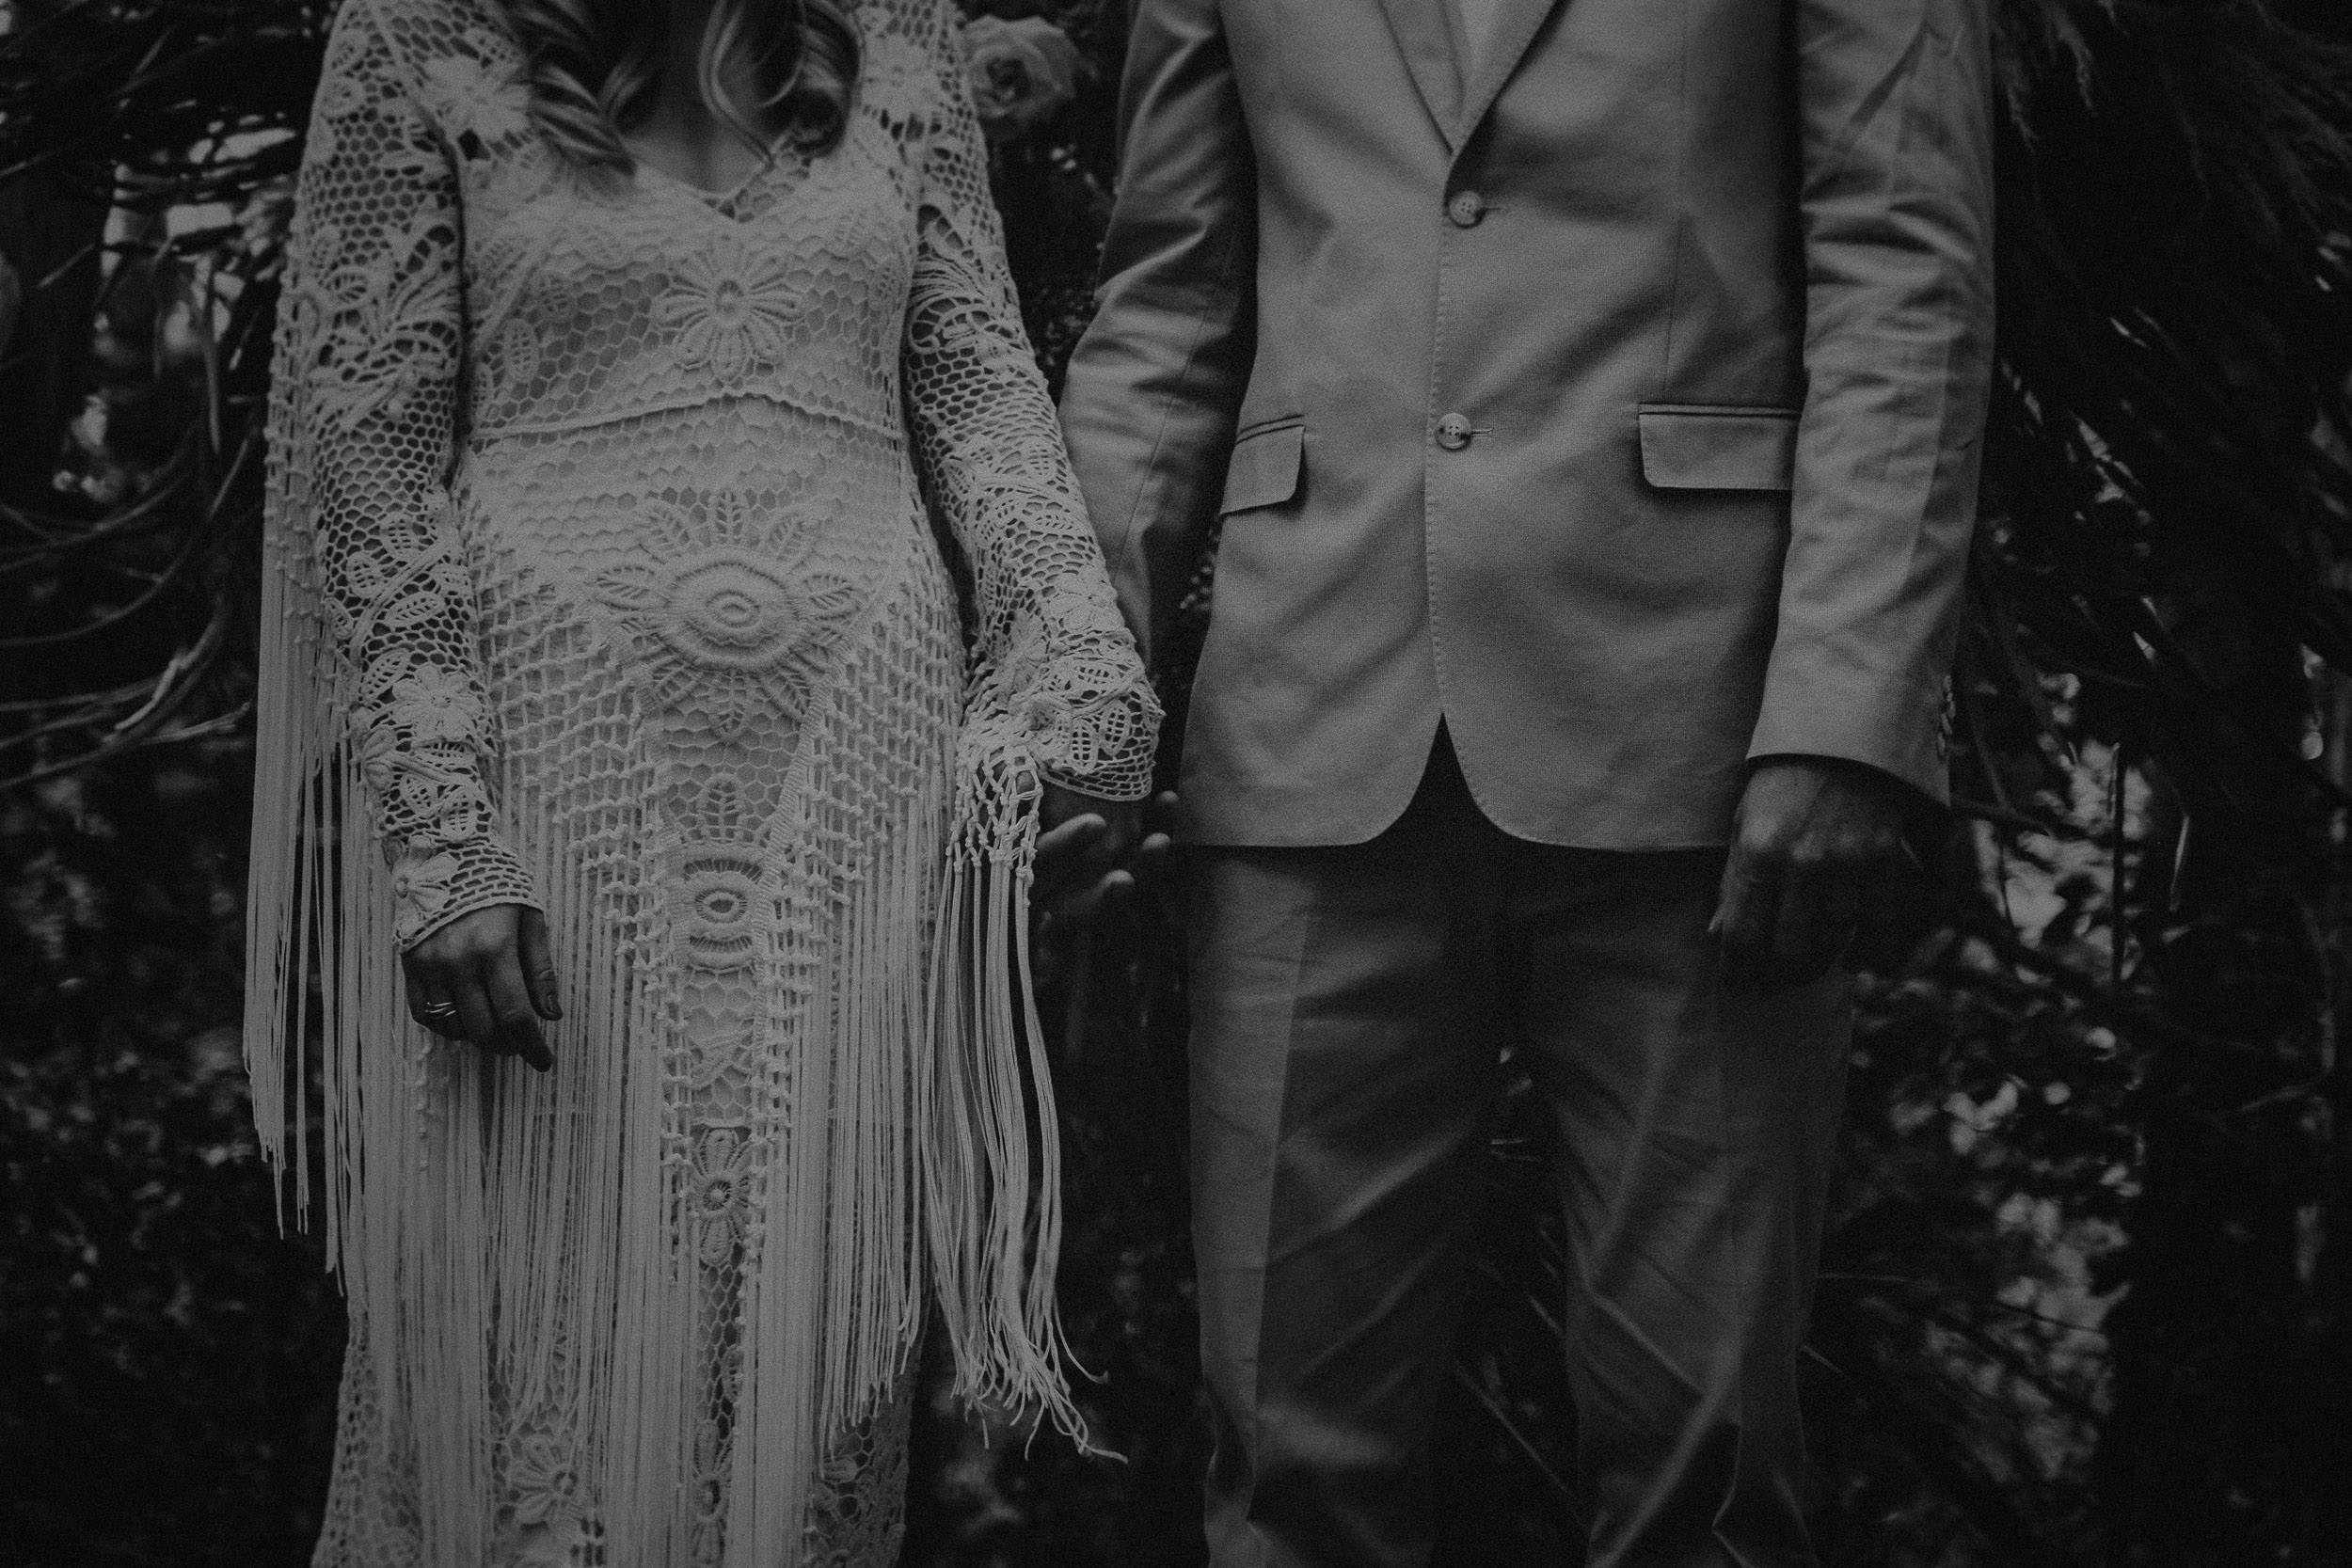 S&A Elopement - Kings & Thieves - Shred 'Til Dead - Central Coast Beach Forest Wedding - 235.jpg